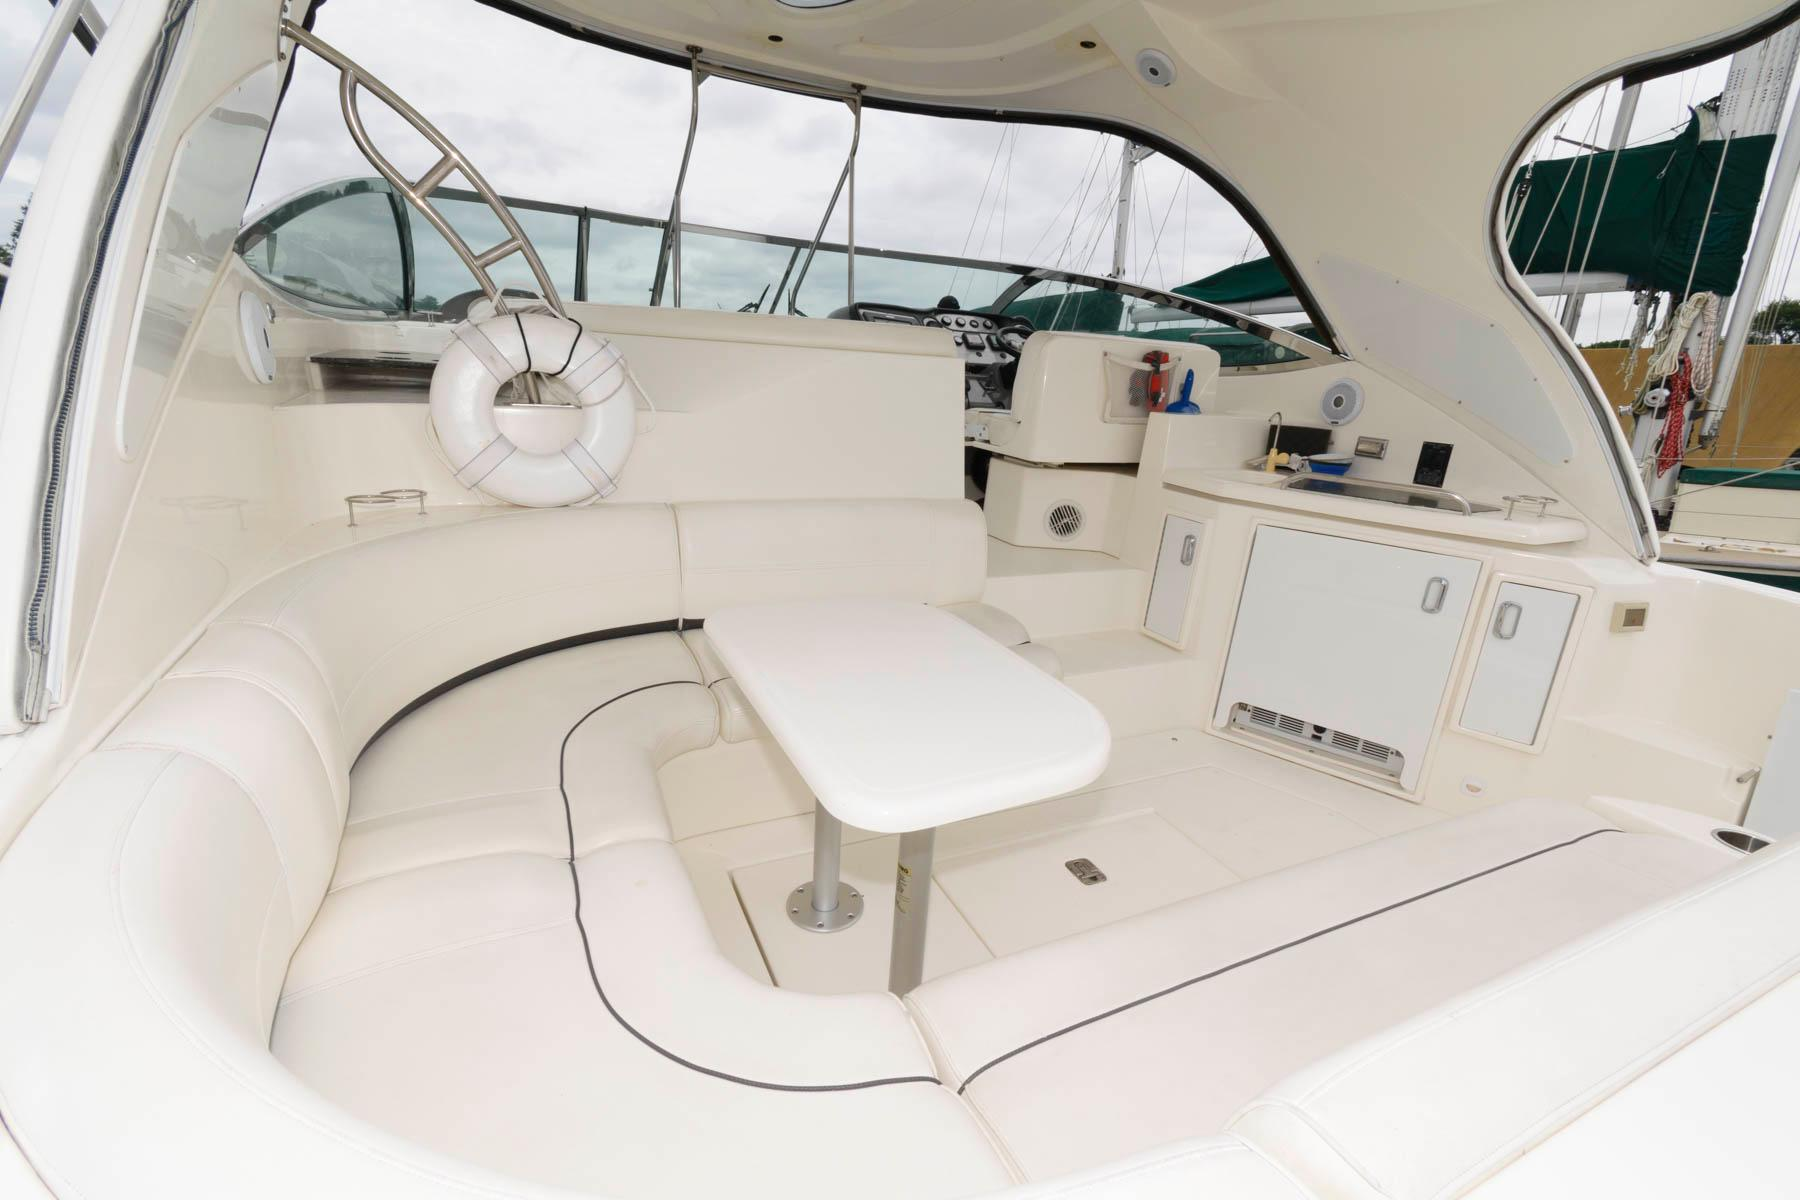 M 6375 KB Knot 10 Yacht Sales